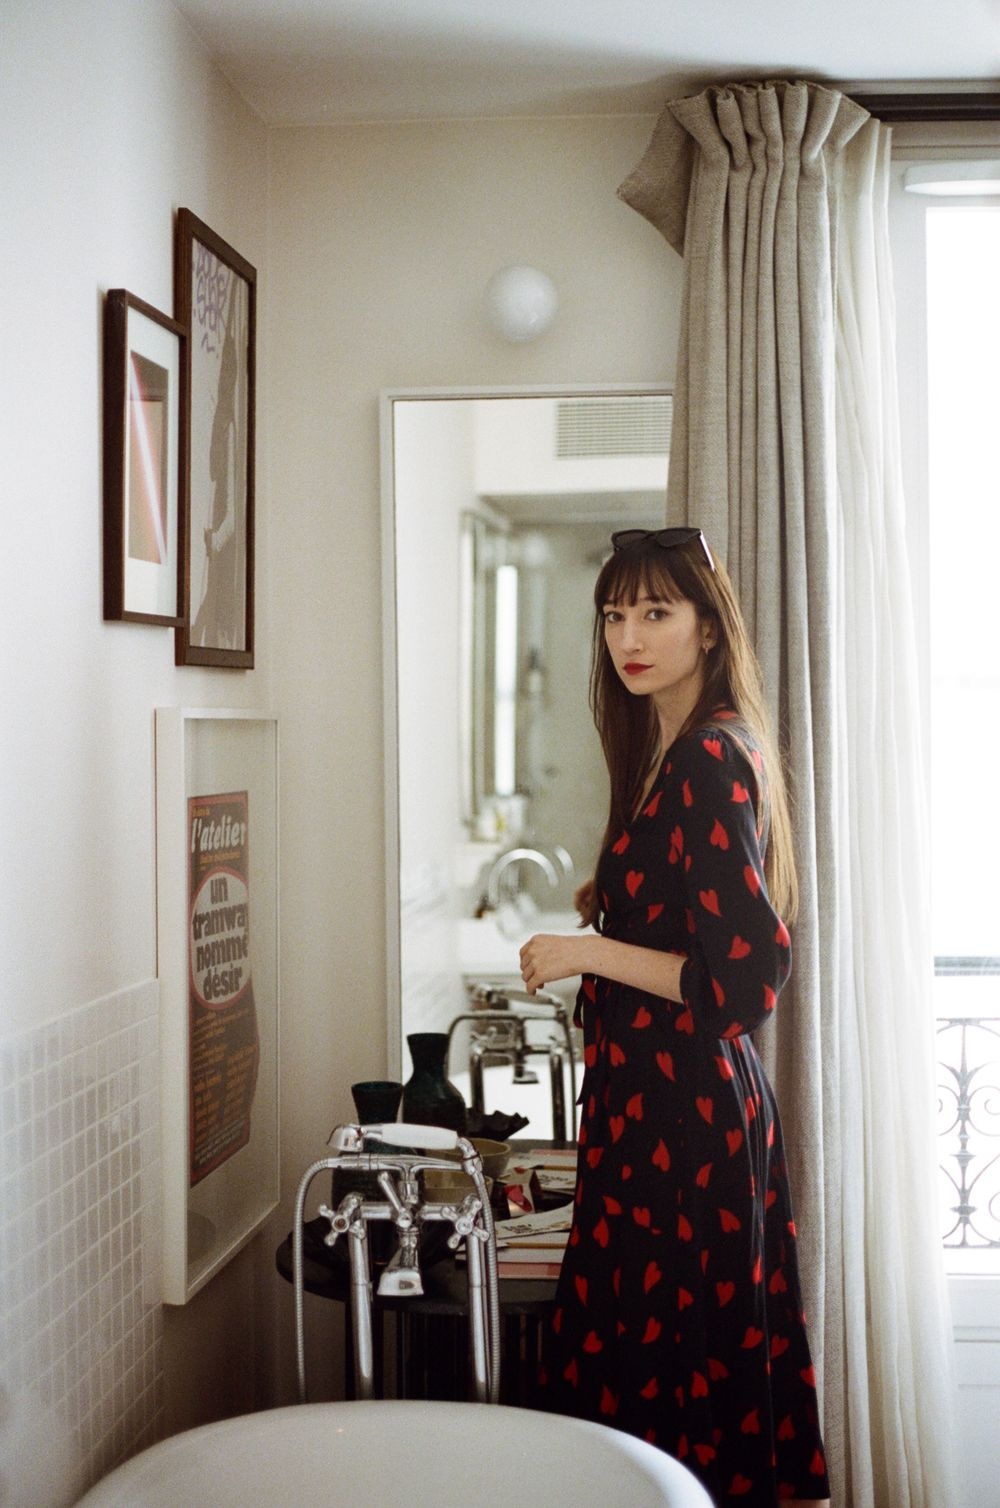 Mirae Victoria Dress Parisian Valentine's Day